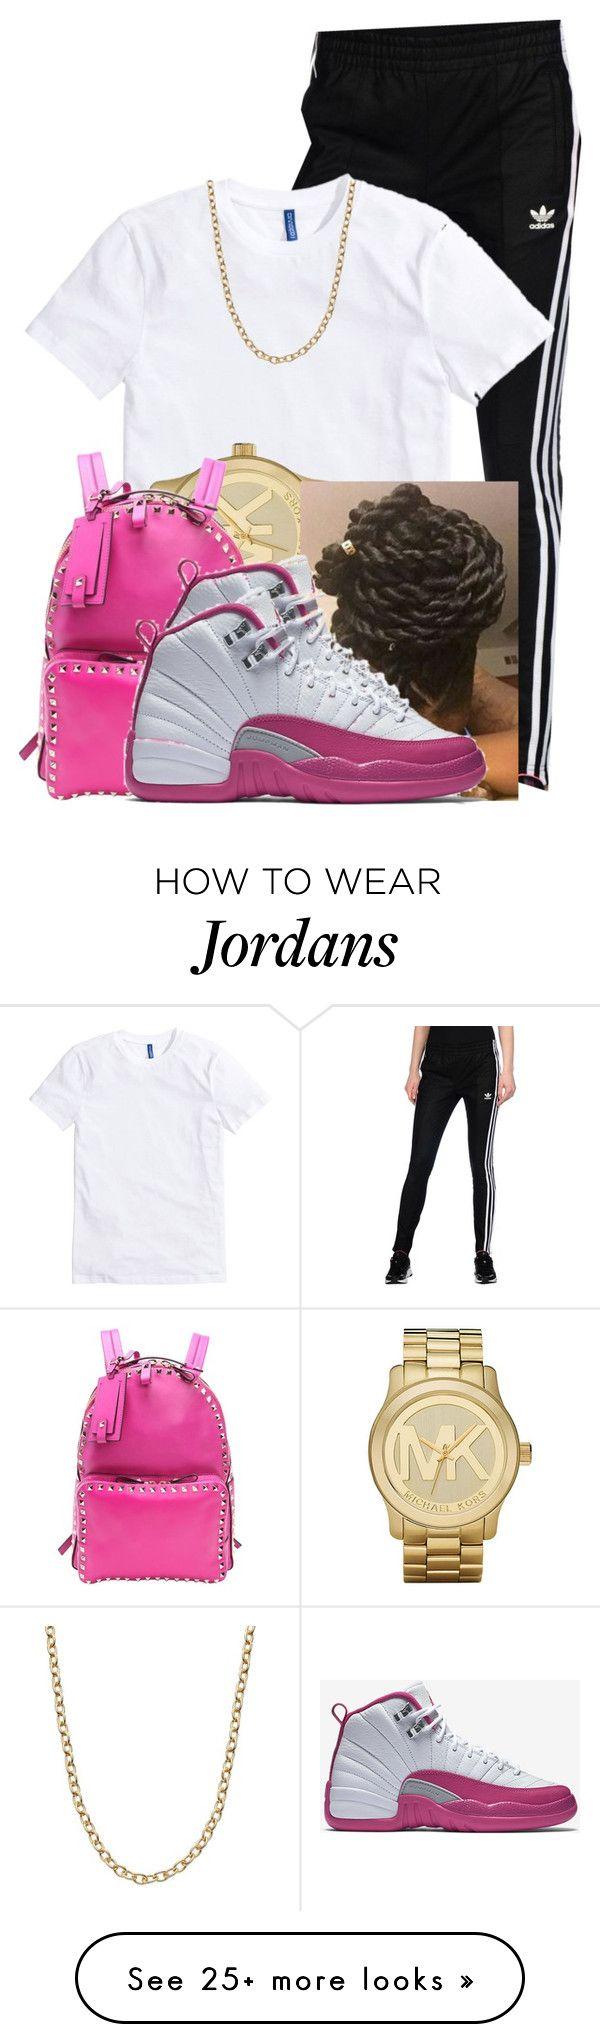 Nike Shoes For Women Running Shoes, Running Shoes For Women, women shoes